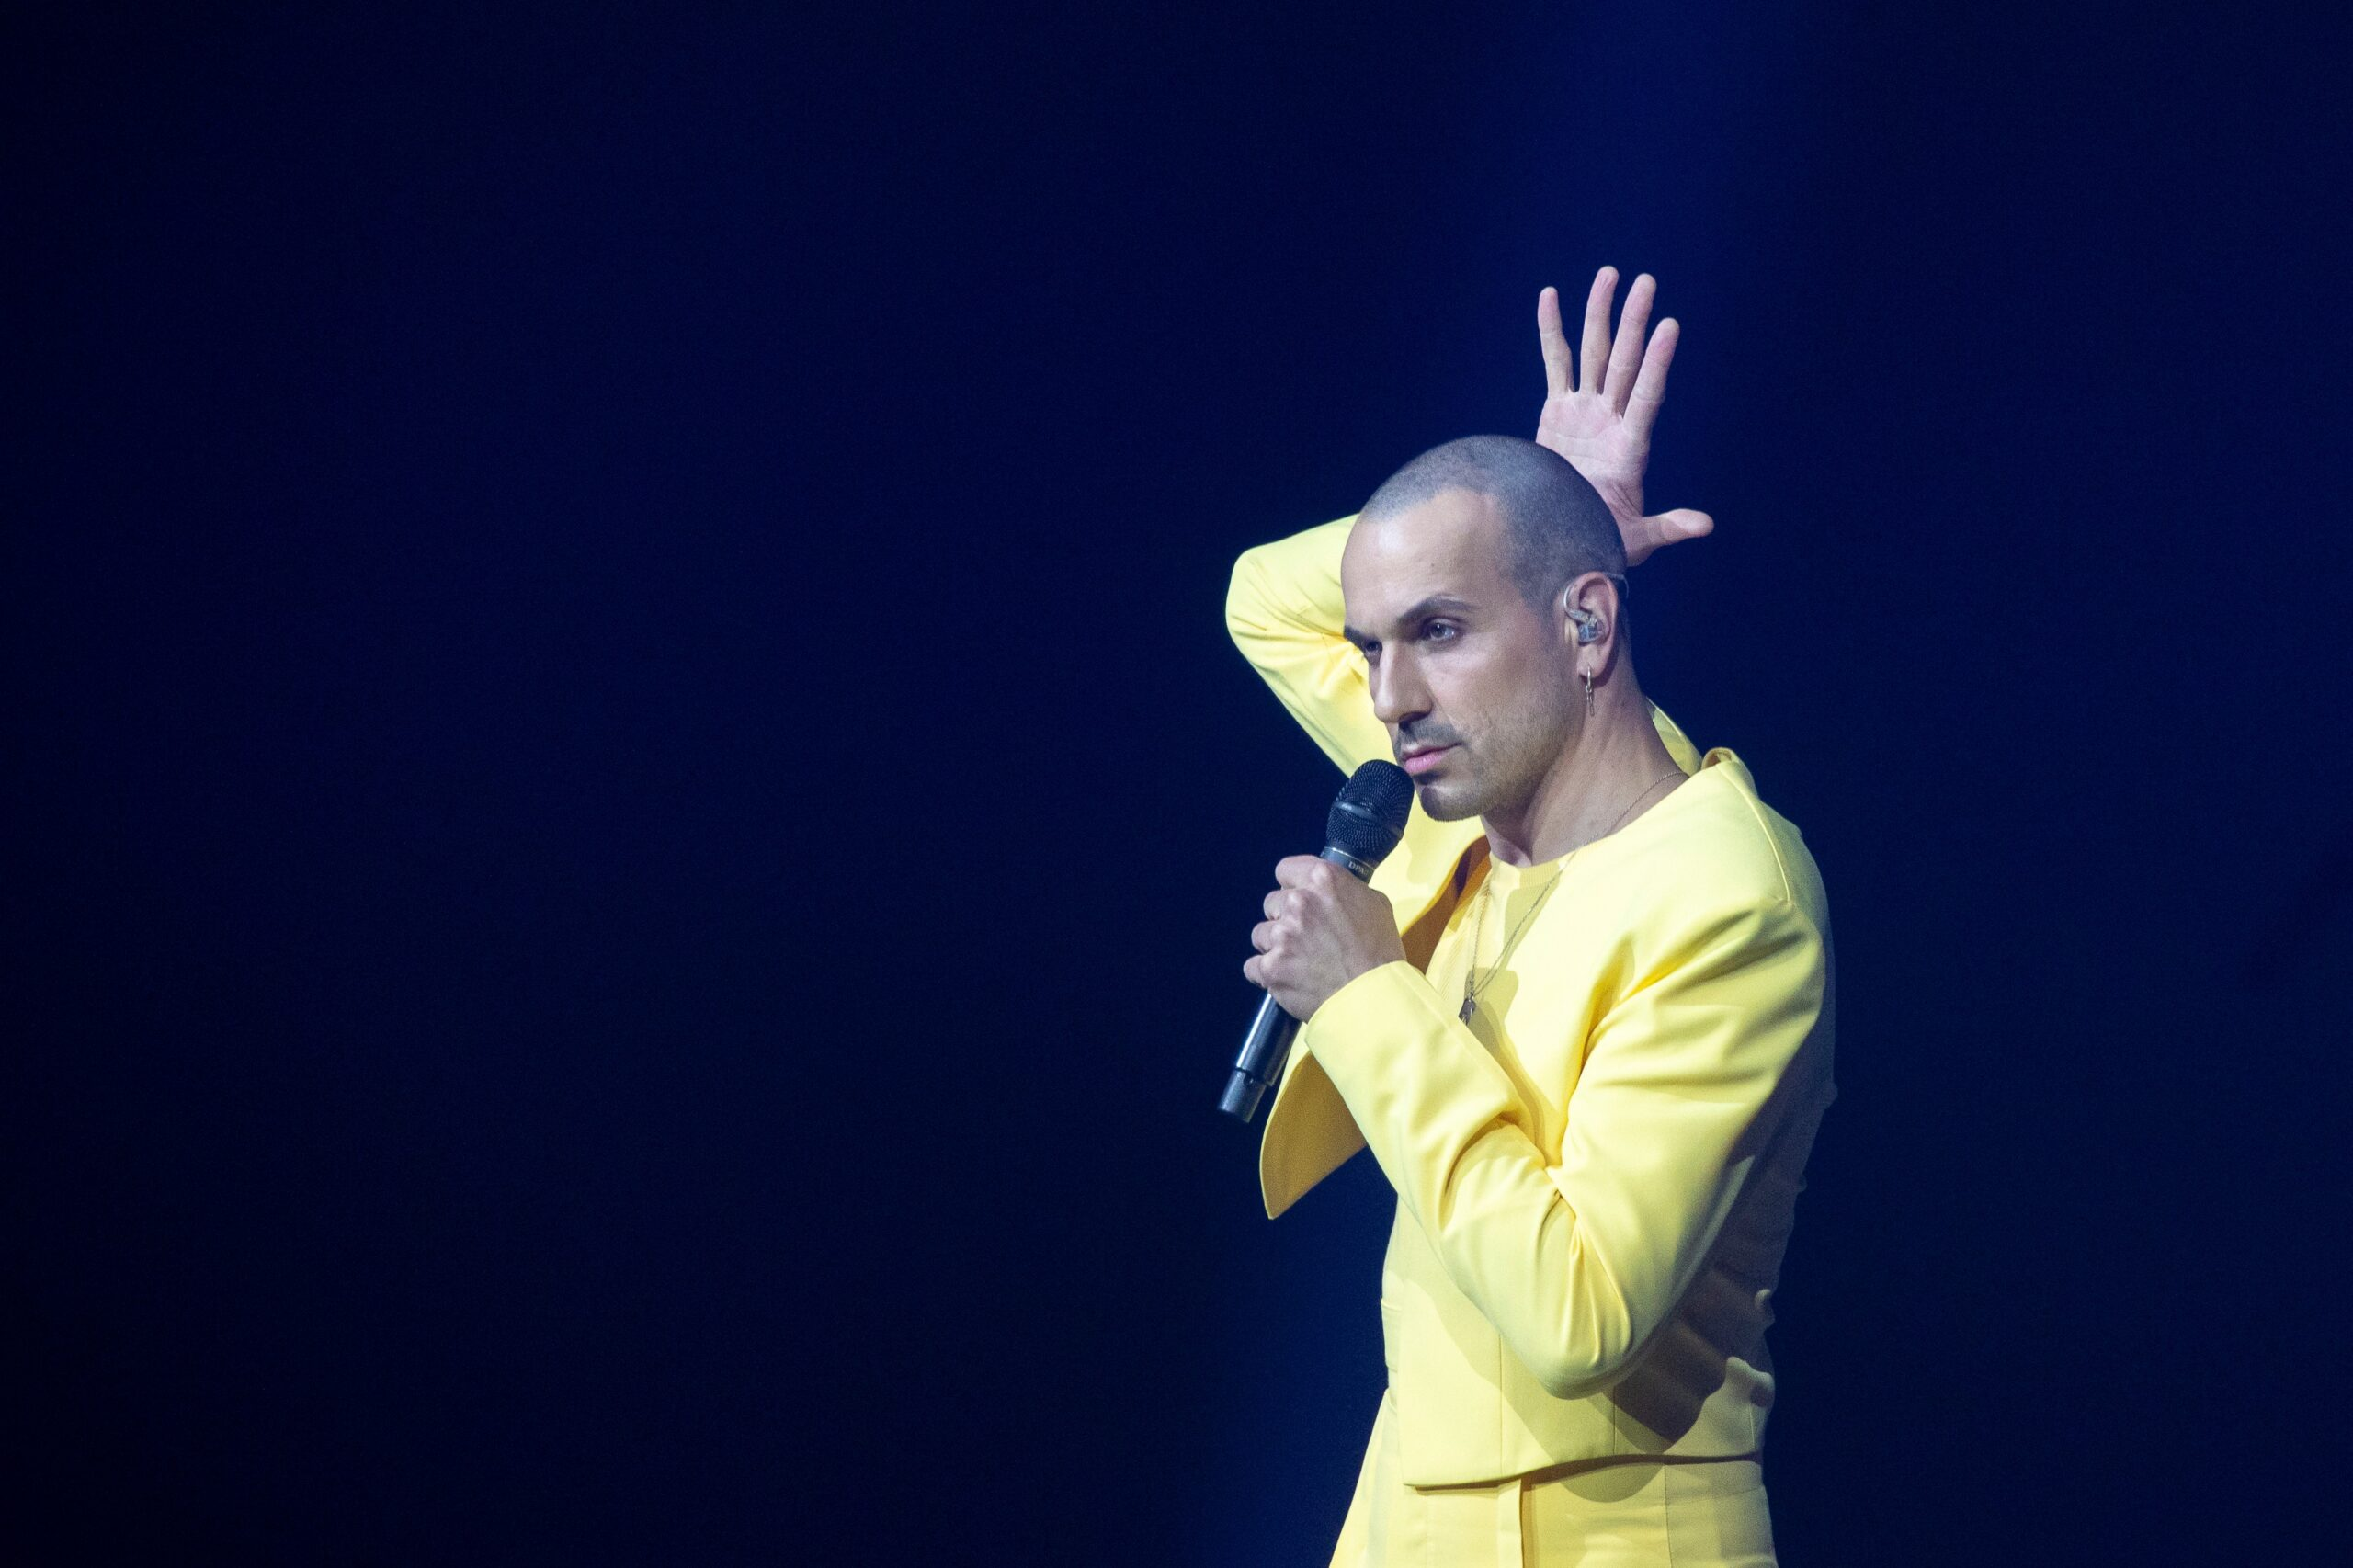 Vegan songfestival deelnemer Litouwen